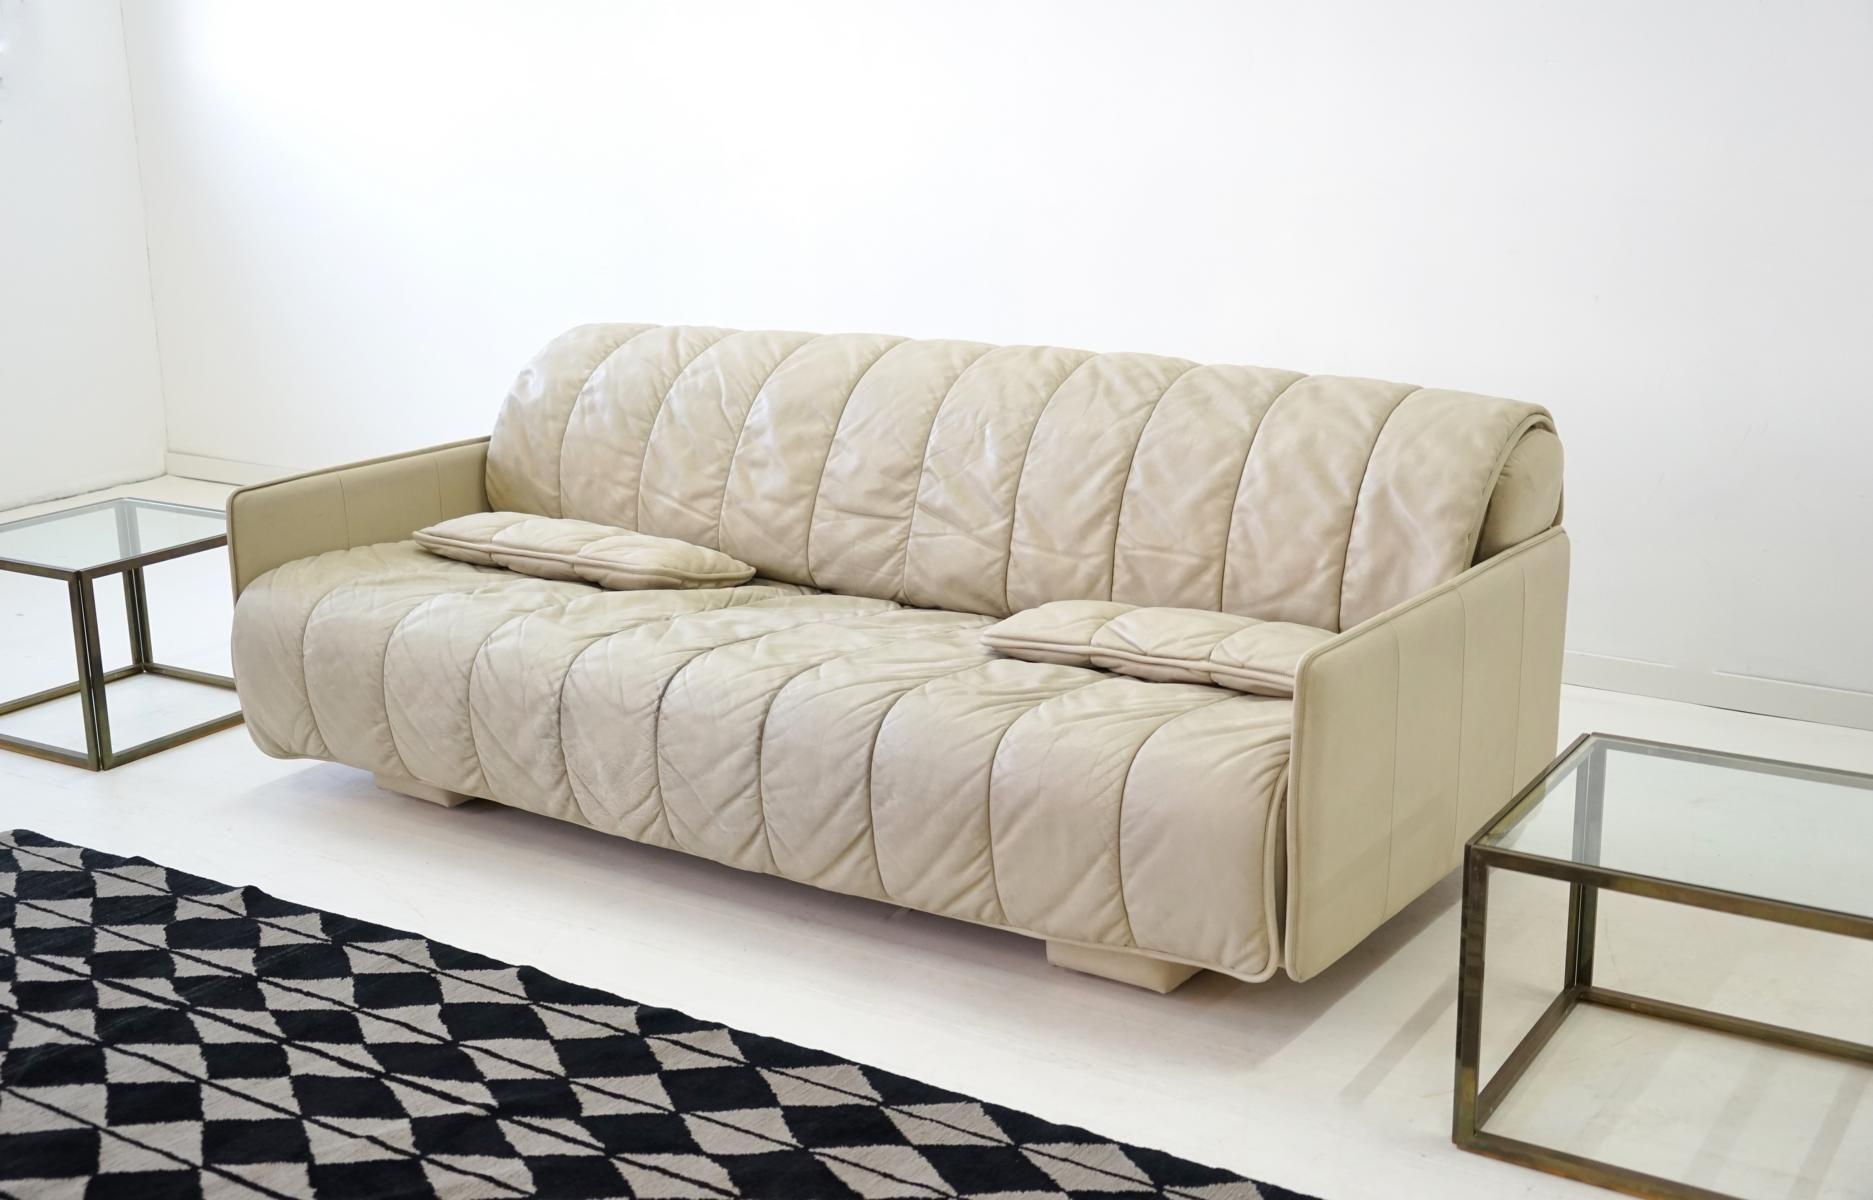 vintage 3 sitzer leder sofa von de sede bei pamono kaufen. Black Bedroom Furniture Sets. Home Design Ideas